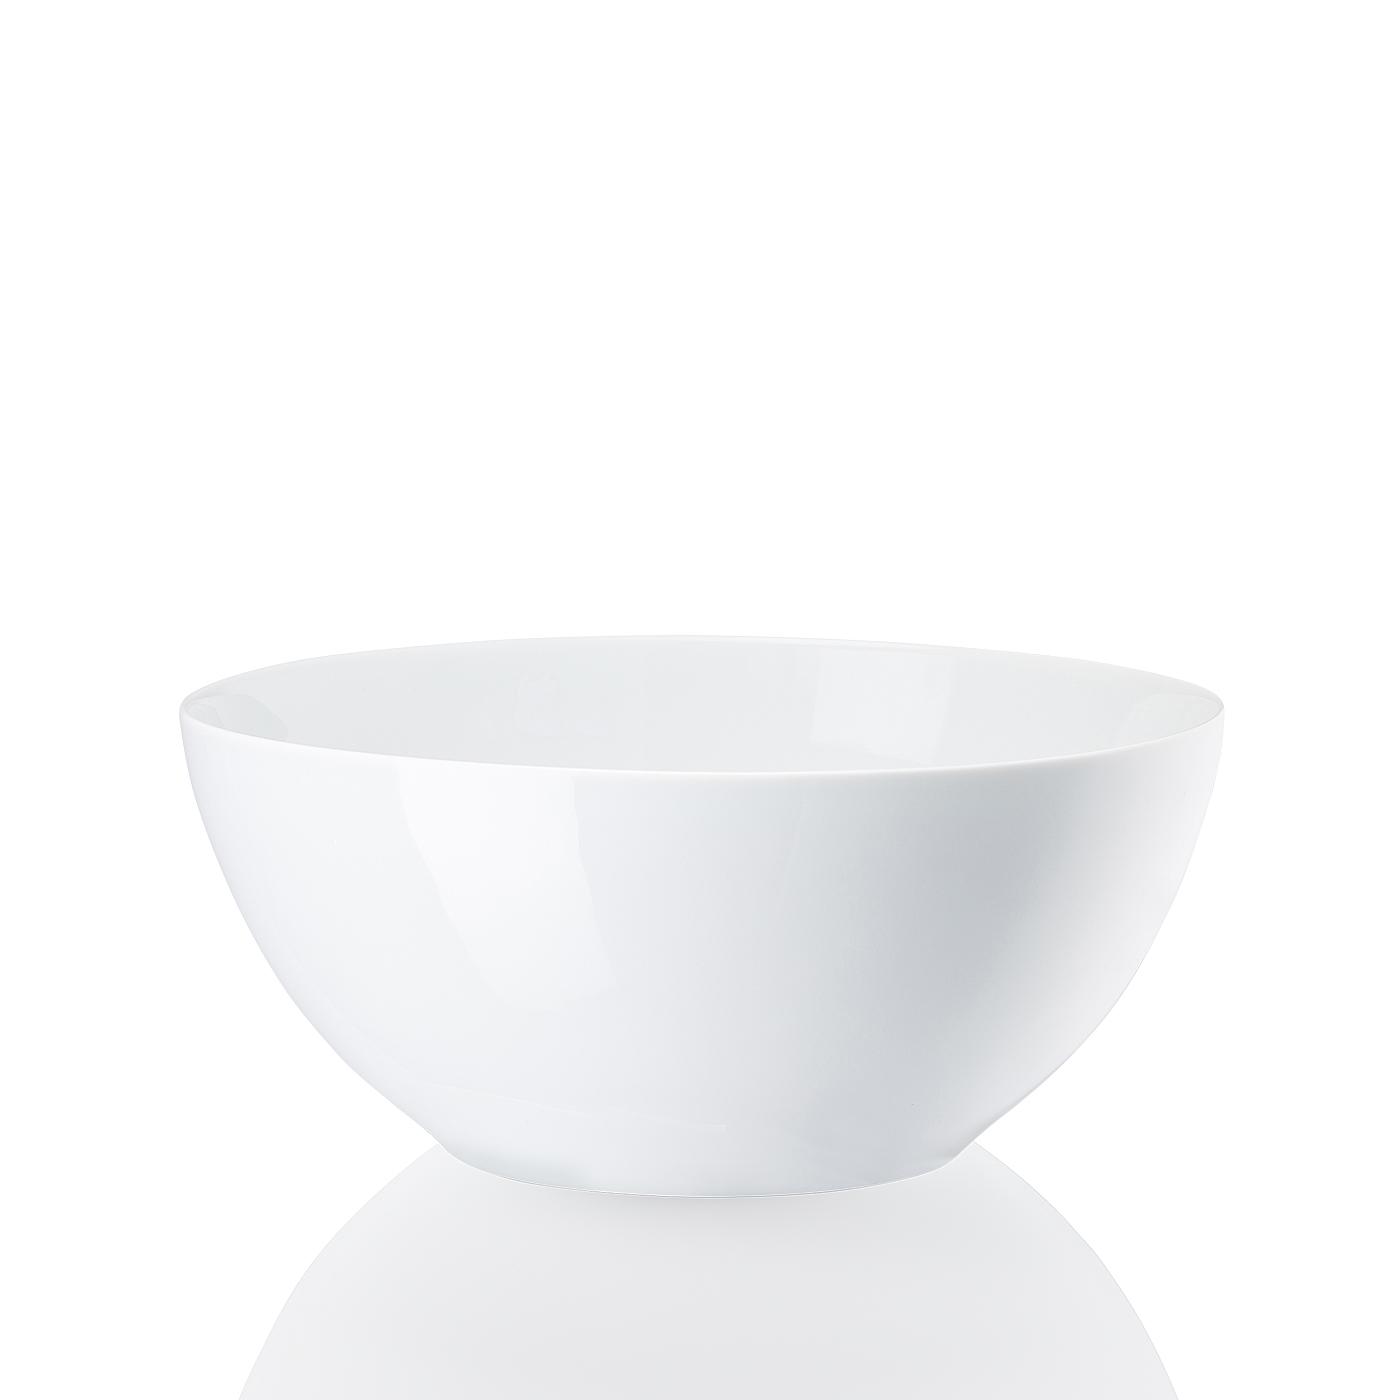 Schüssel 28 cm Cucina Bianca Arzberg